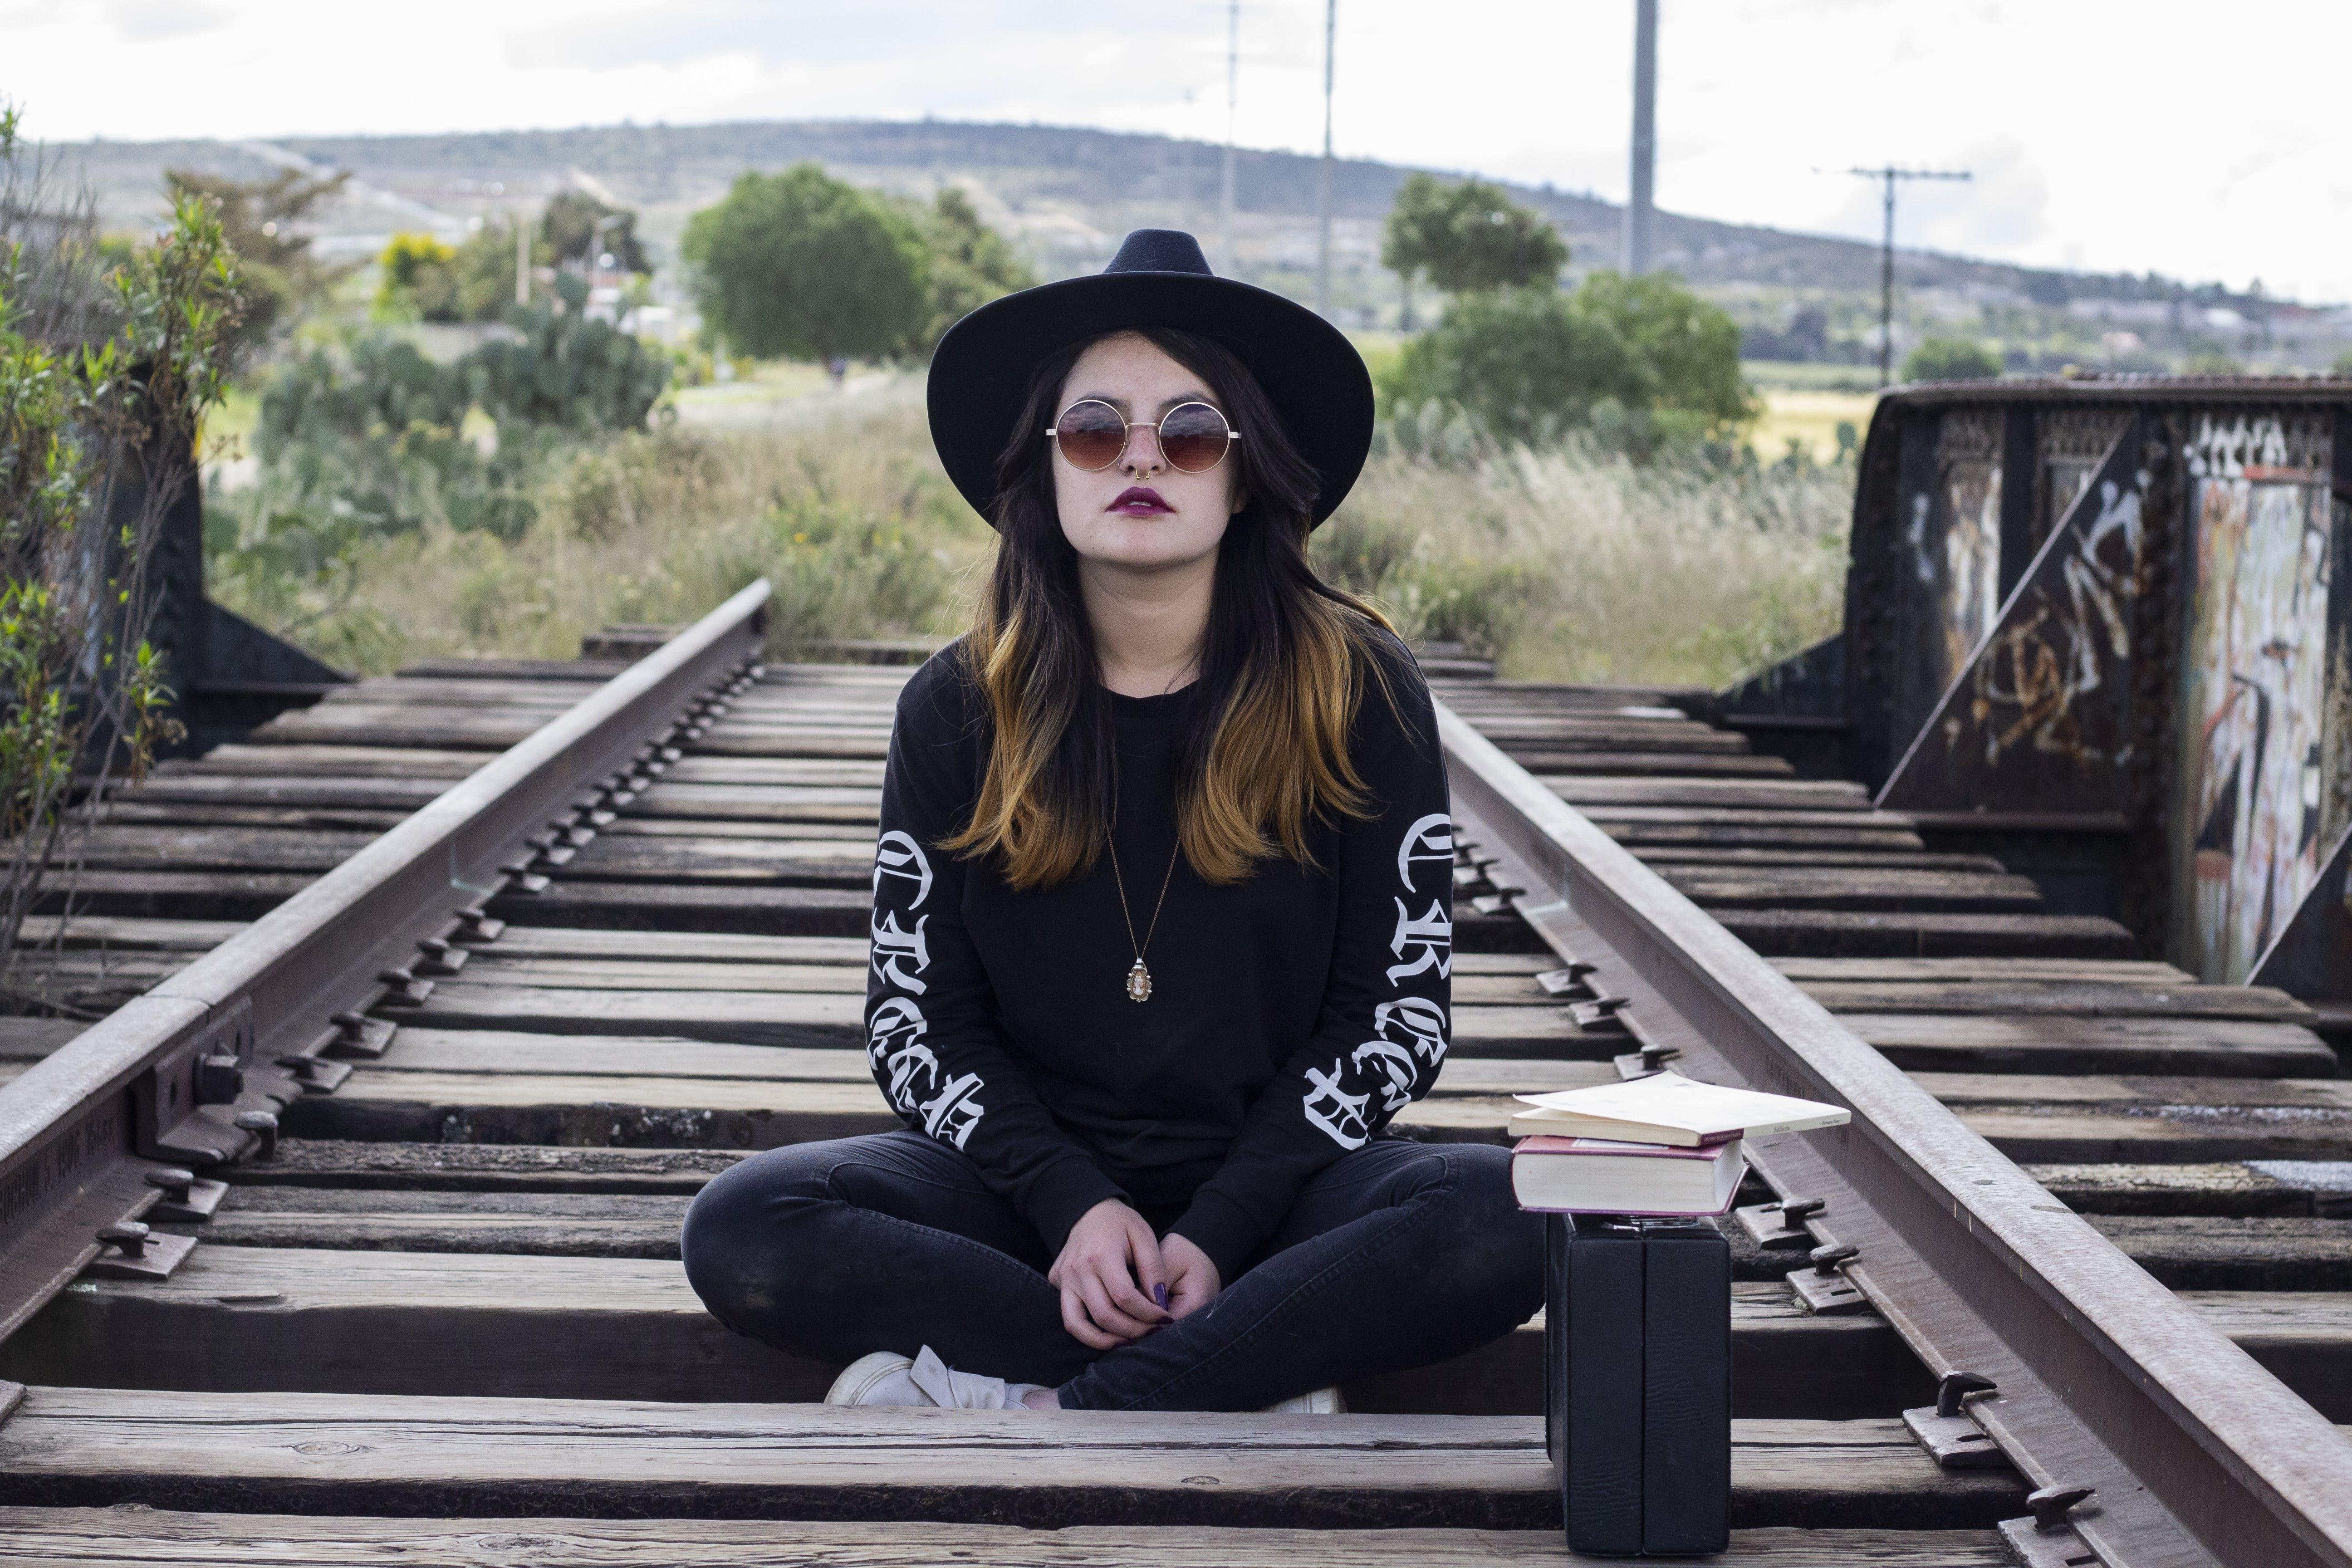 Woman Sitting on Railway